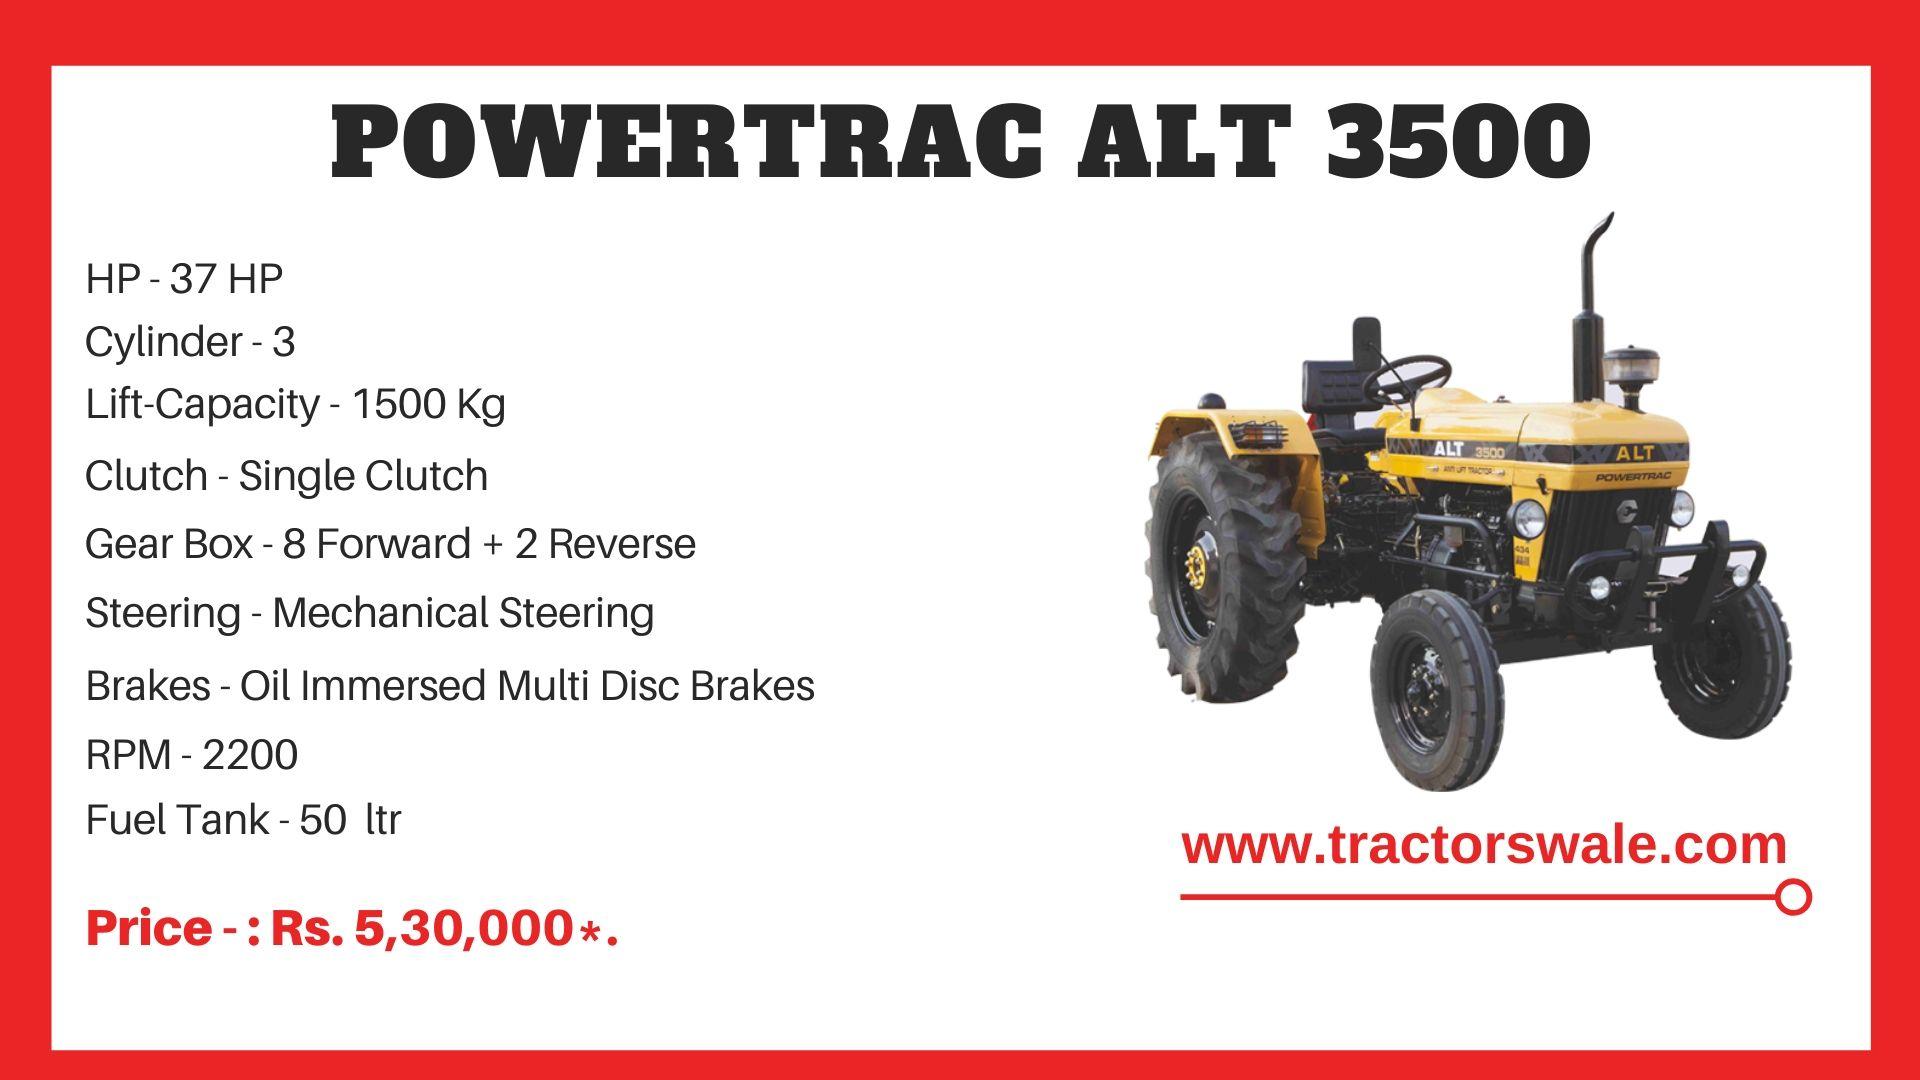 PowerTrac ALT 3500 Tractor Price